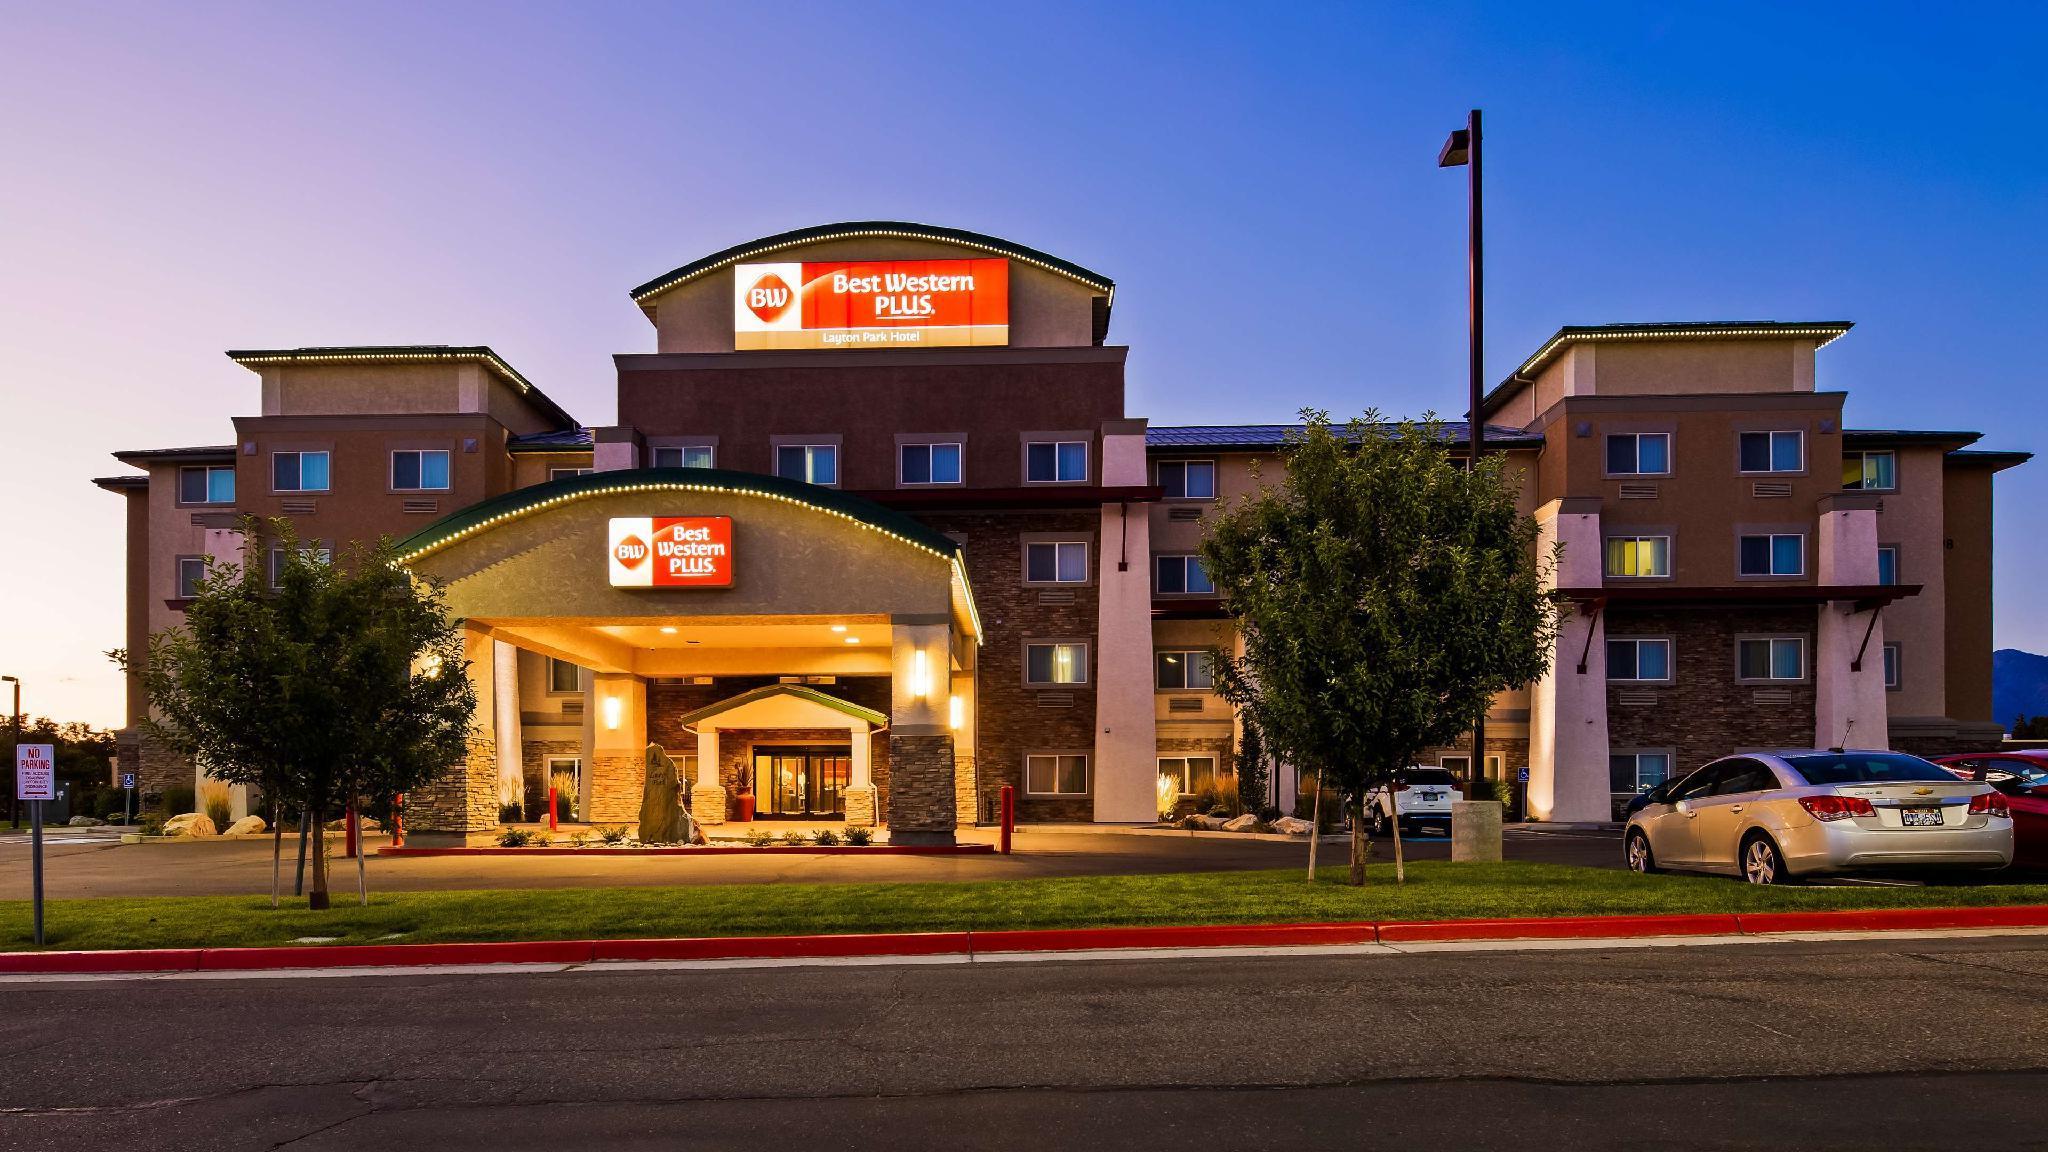 Best Western PLUS Layton Park Hotel